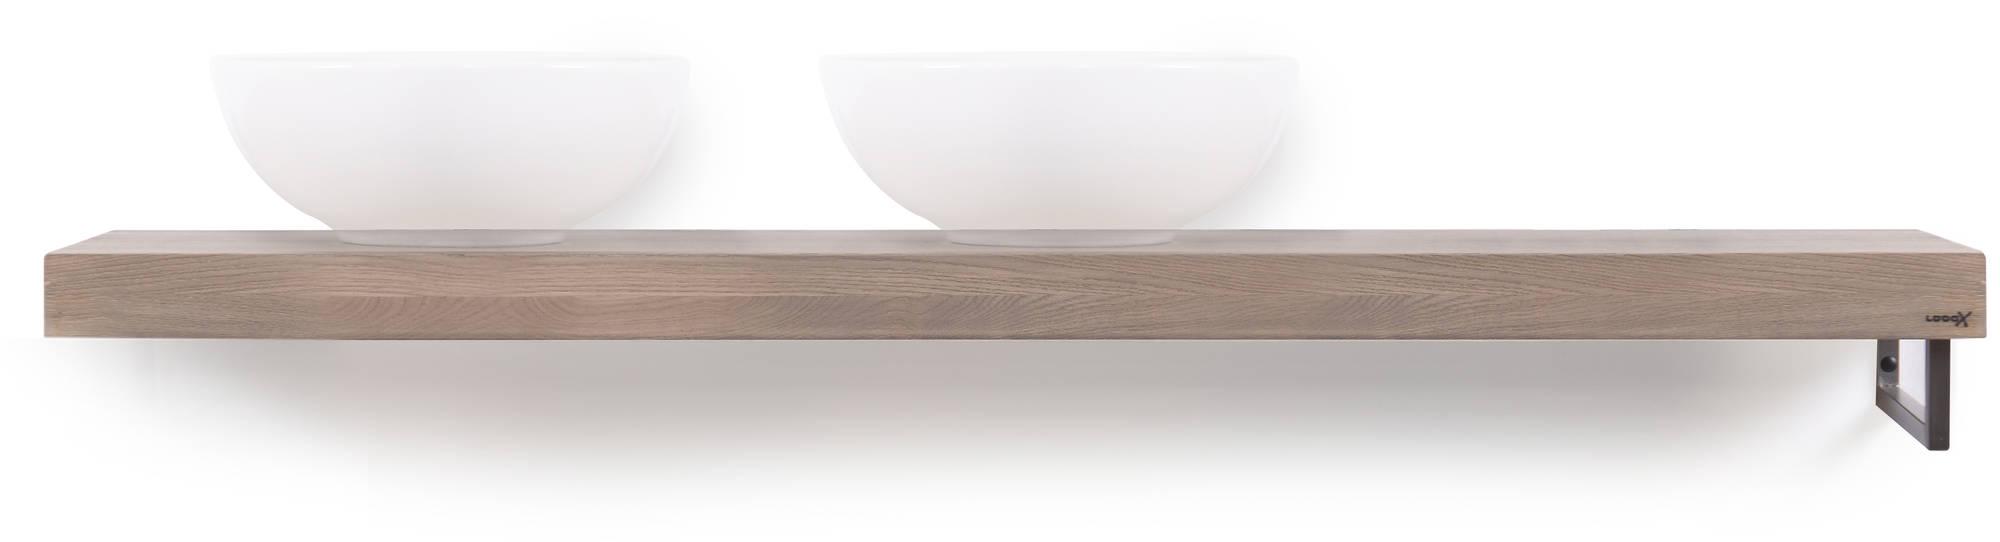 Looox Wooden Base Shelf Solo 160 cm Houder Rechts Old Grey/RVS